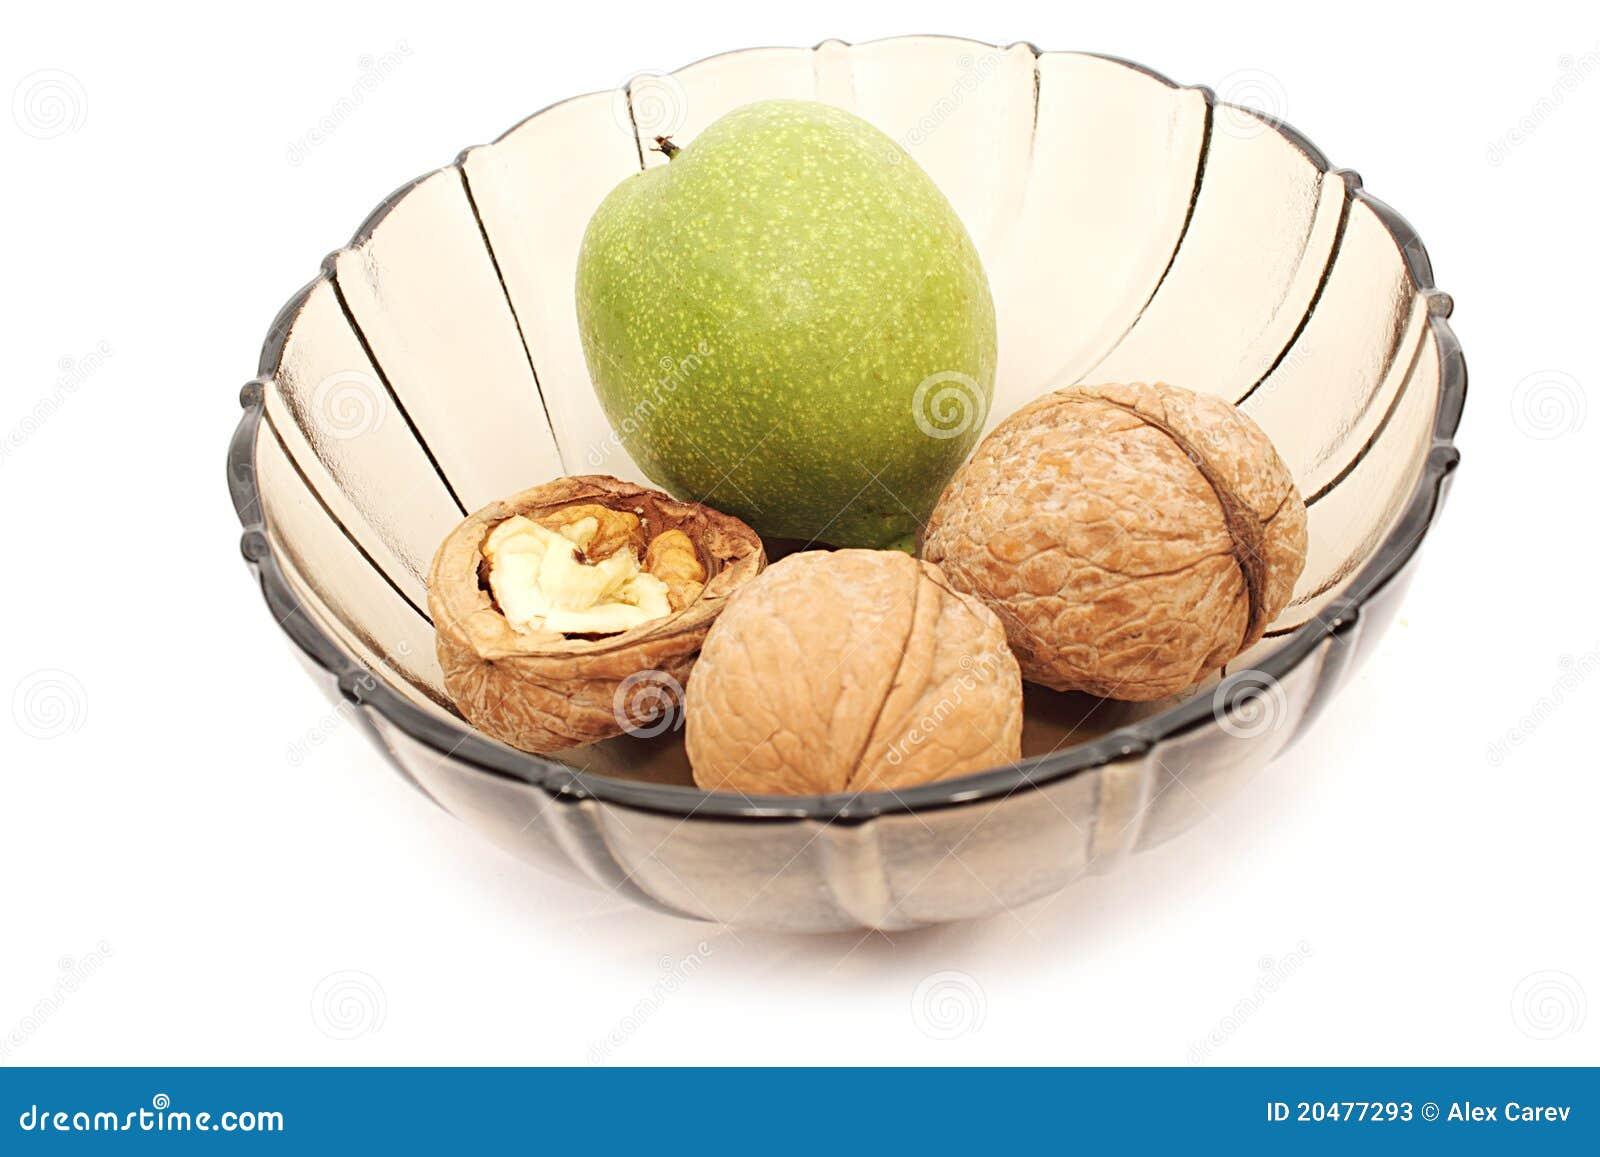 how to open unopened pistachio nuts